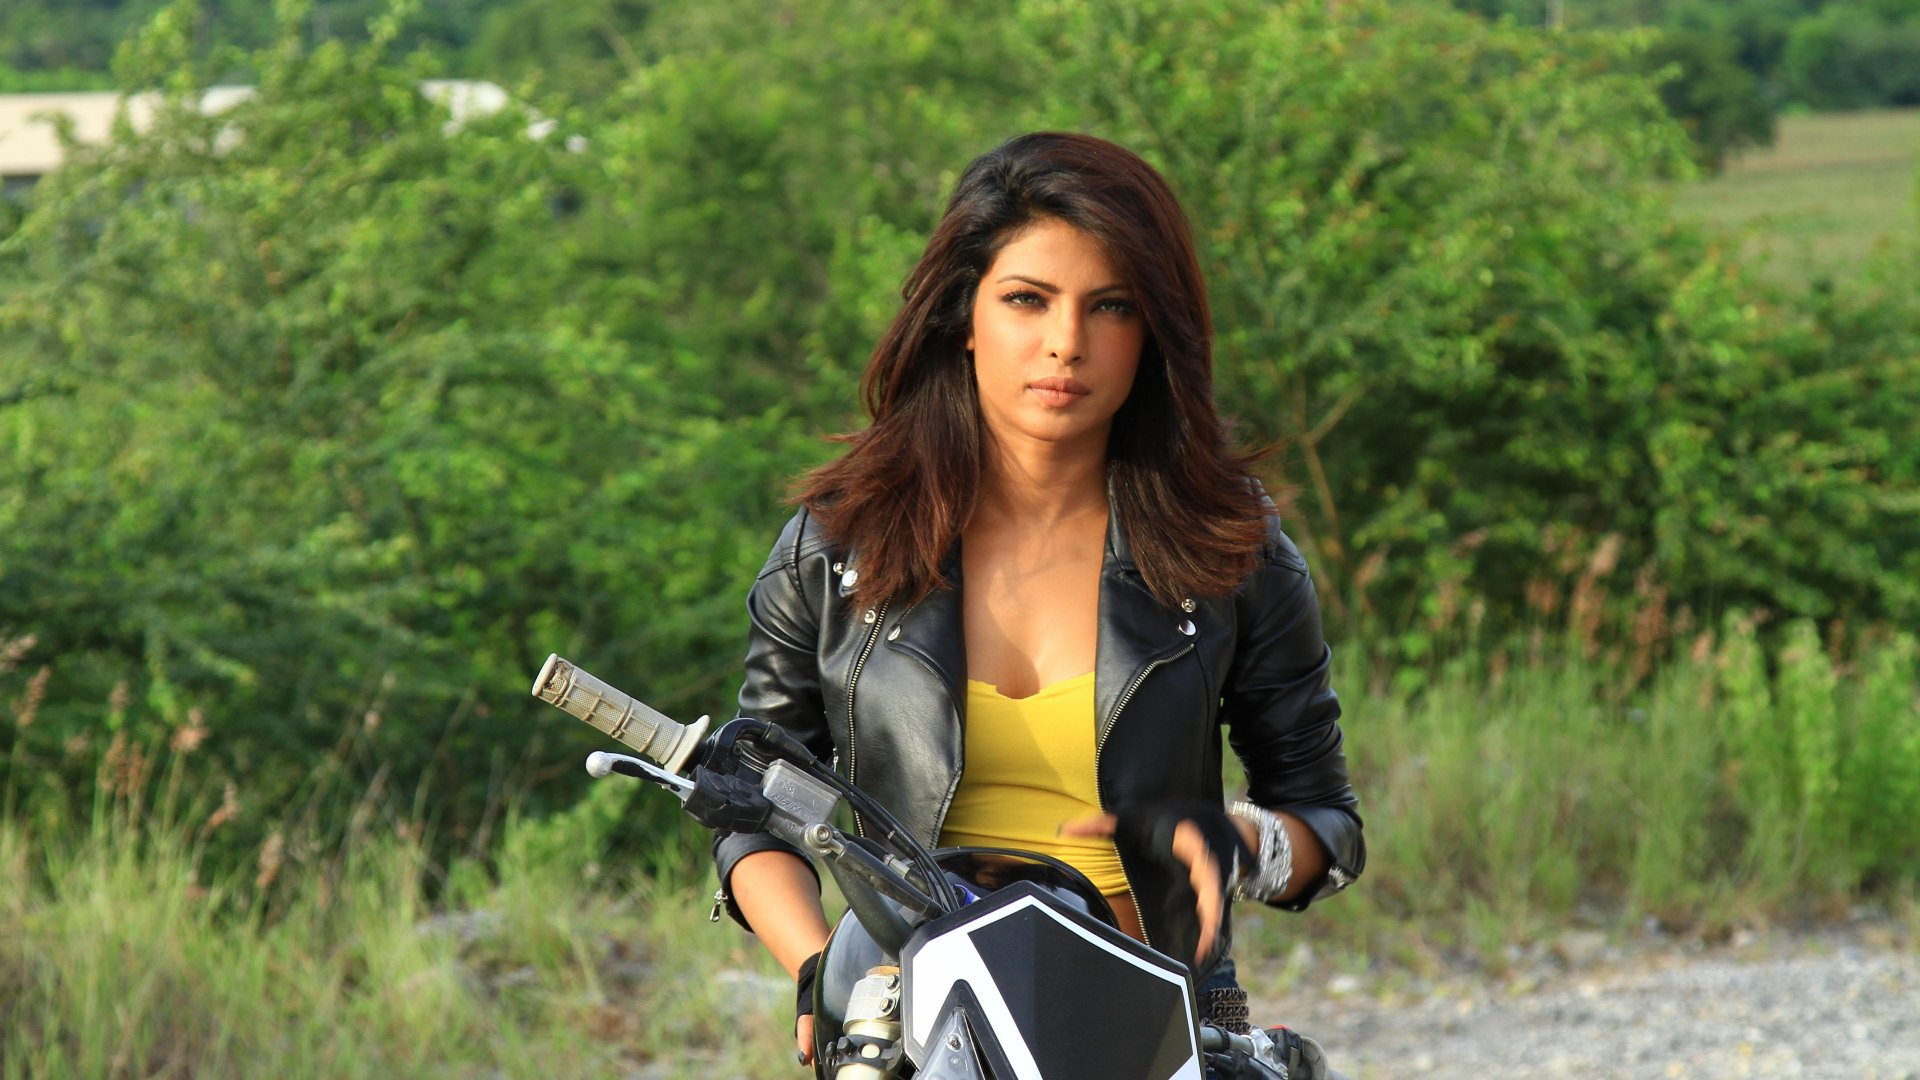 priyanka chopra on bike wallpaper background